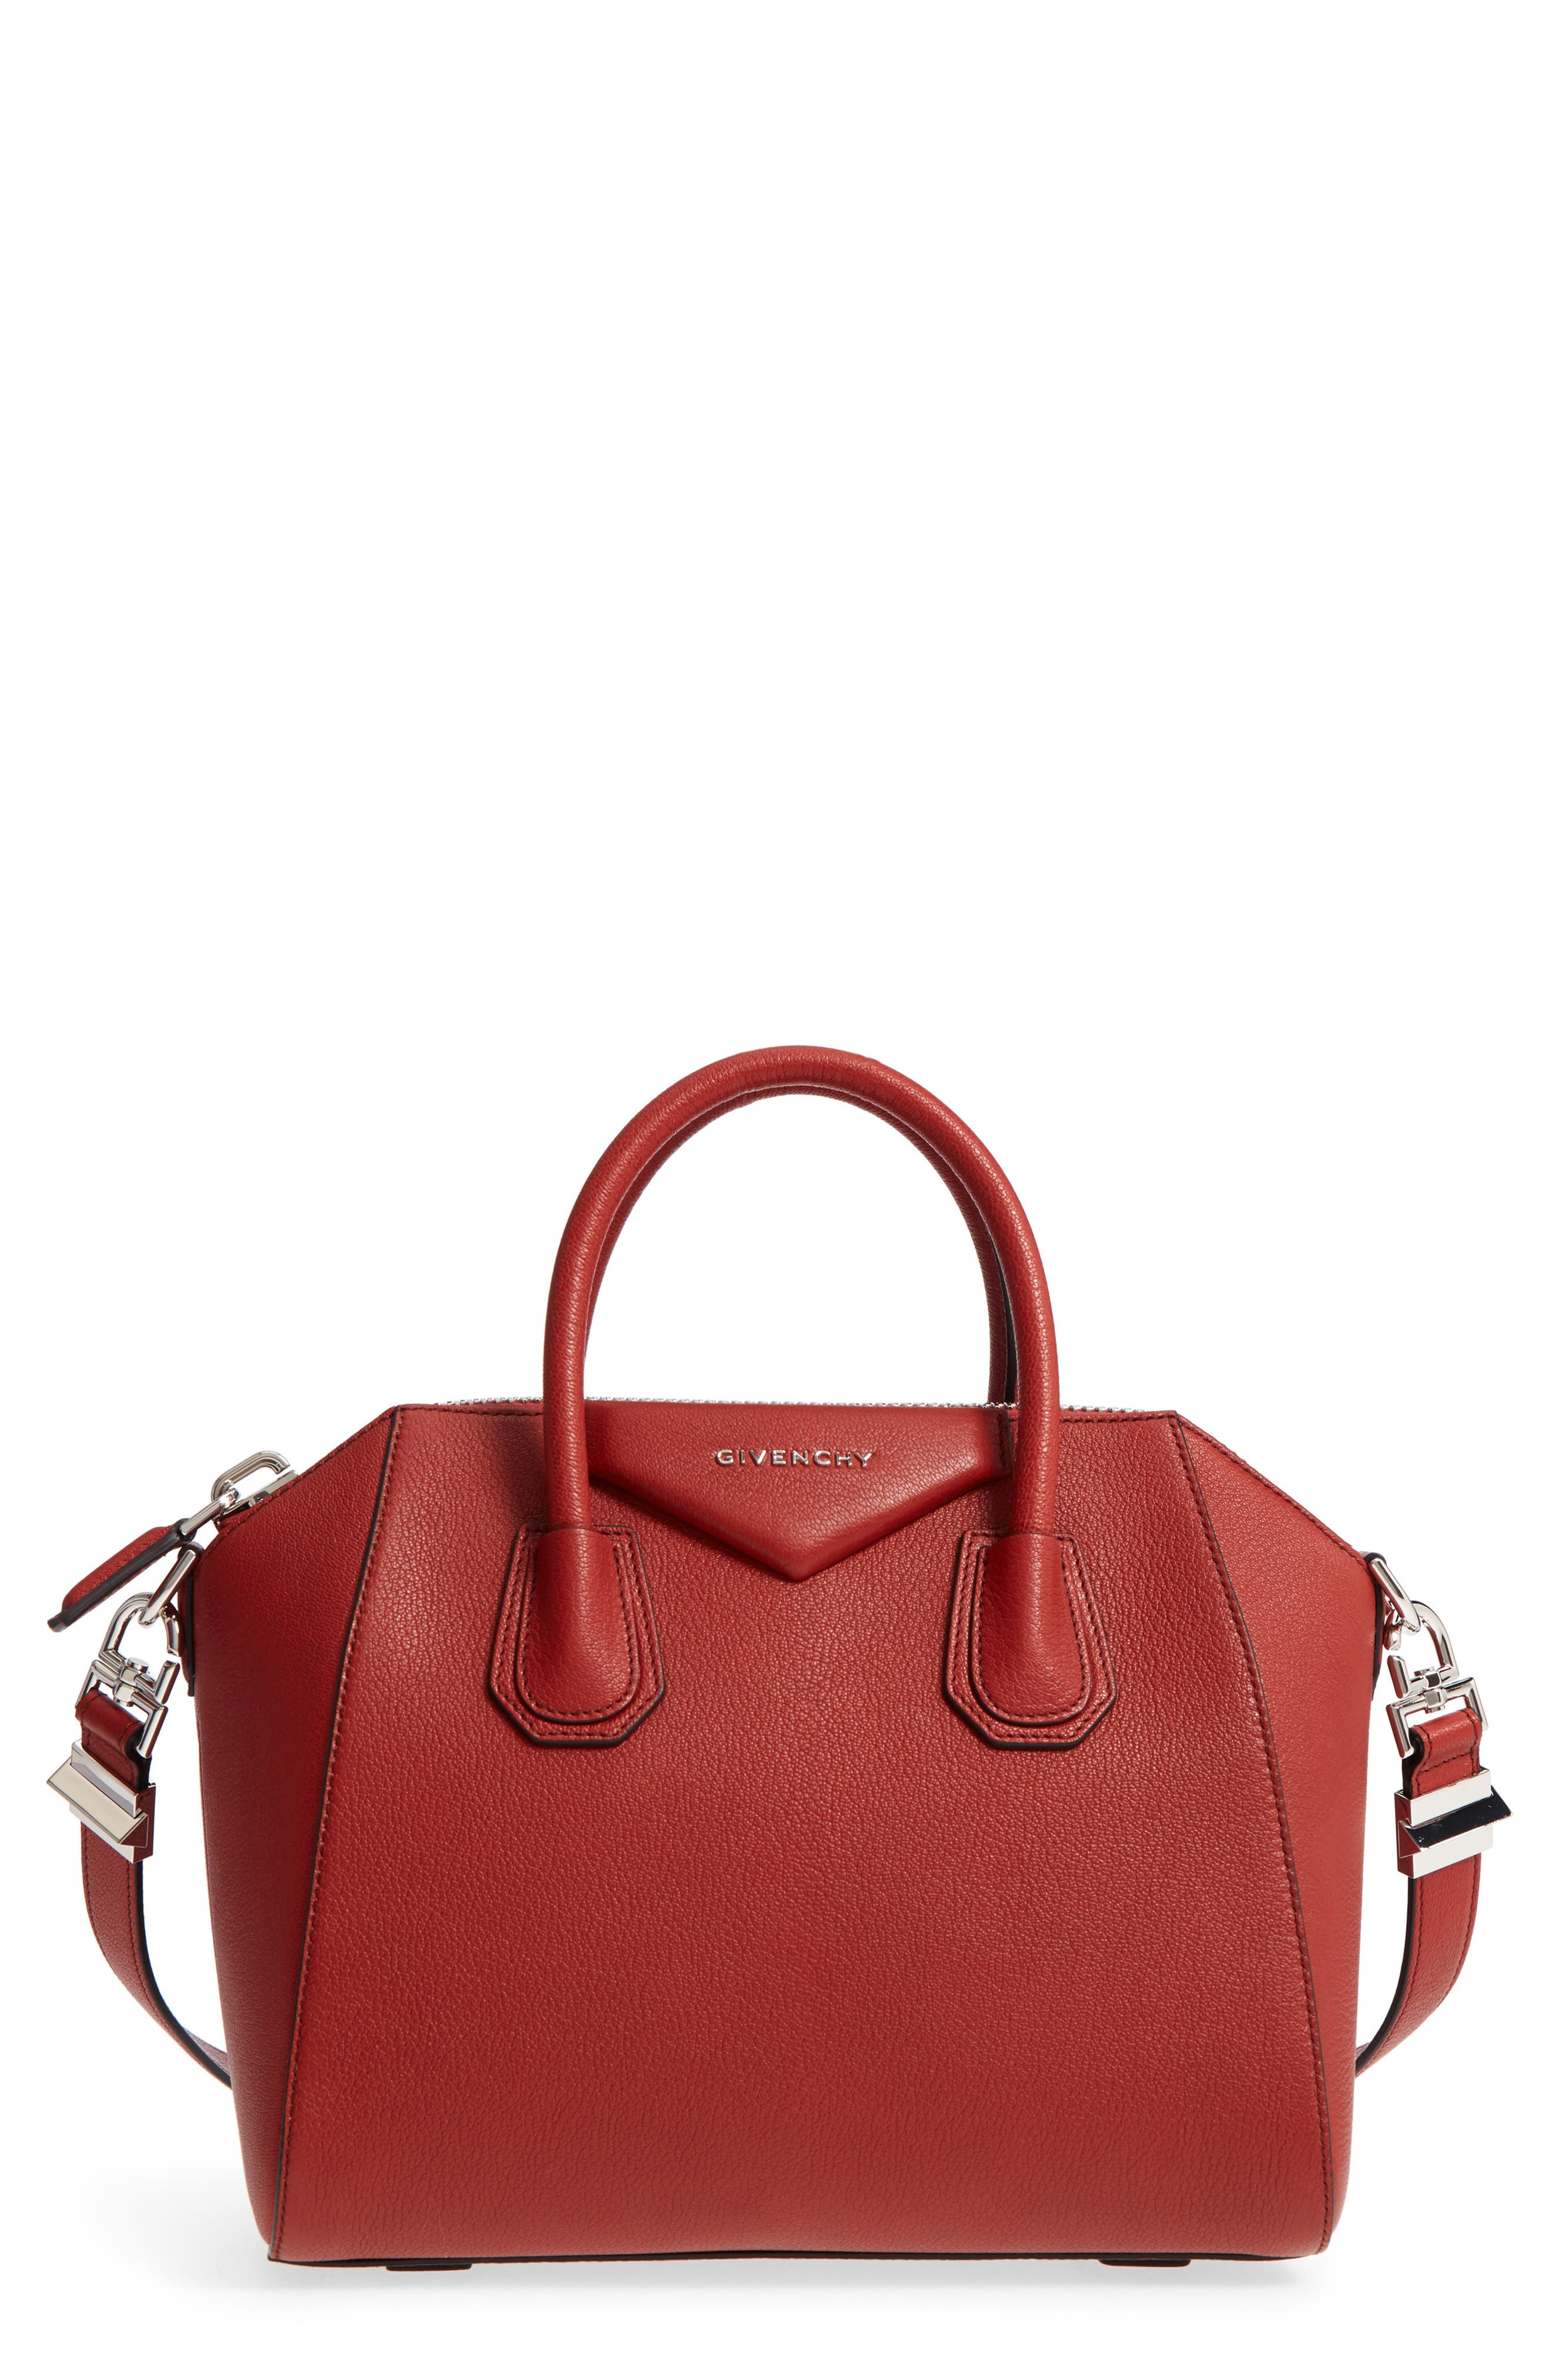 Alternate Image 1 Selected - Givenchy 'Small Antigona' Leather Satchel